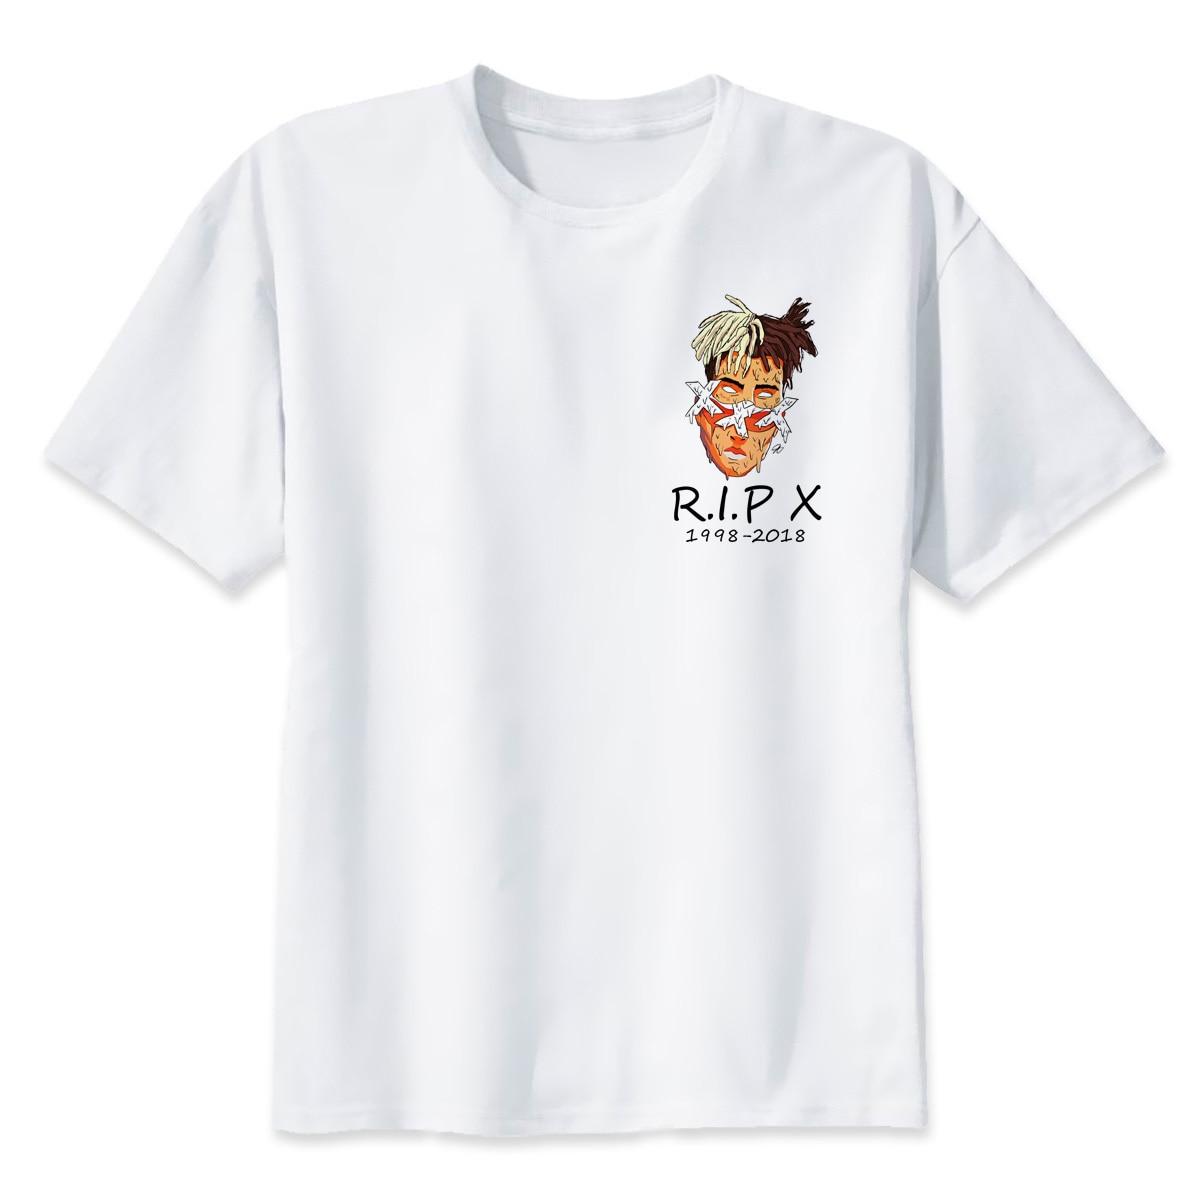 Xxxtentacion R.I.P personaje impreso camiseta moda Casual Fitness Cool o-cuello hombres camiseta verano manga corta hombres ropa